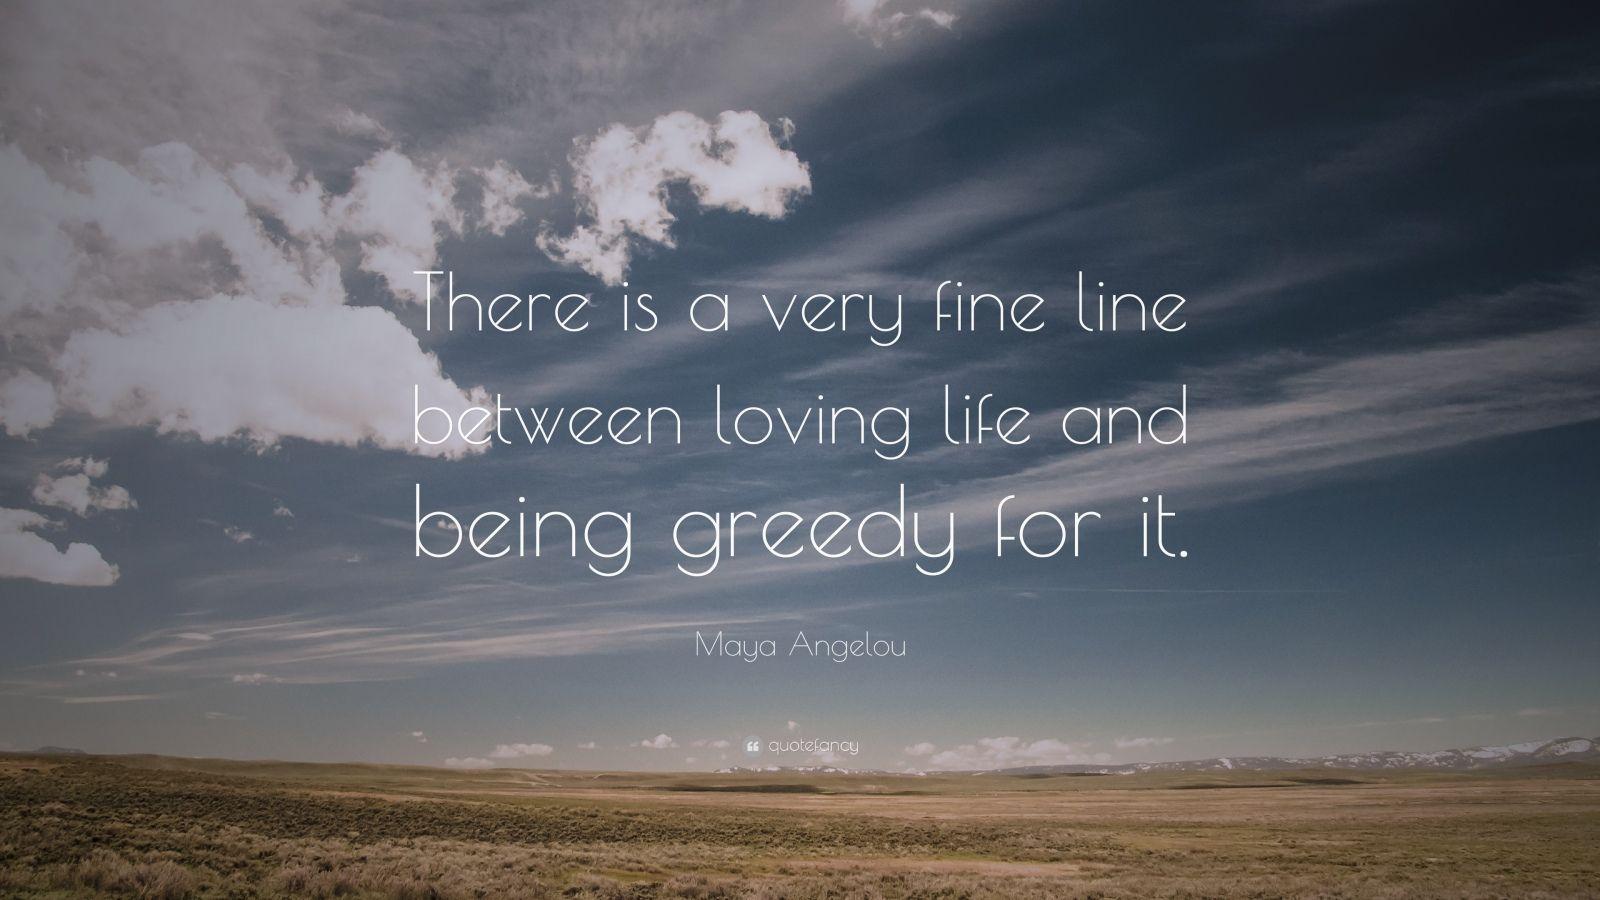 Inspiring Relationship Quotes Wallpaper Maya Angelou Quotes 100 Wallpapers Quotefancy